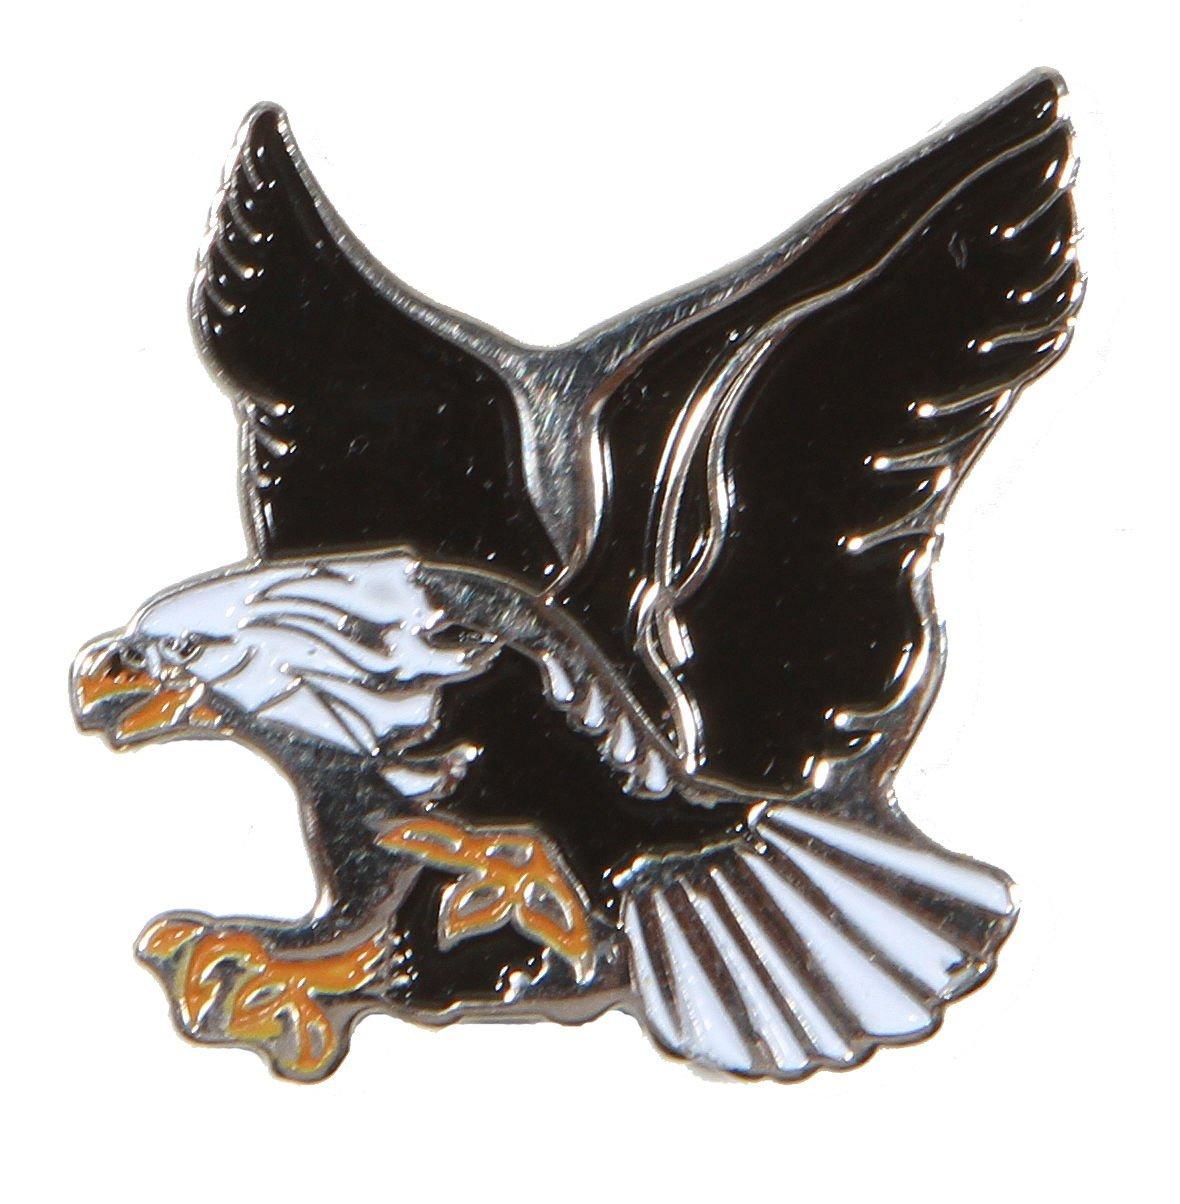 Eagle Metal Golf Ball Marker & Magnetic Hat Clip